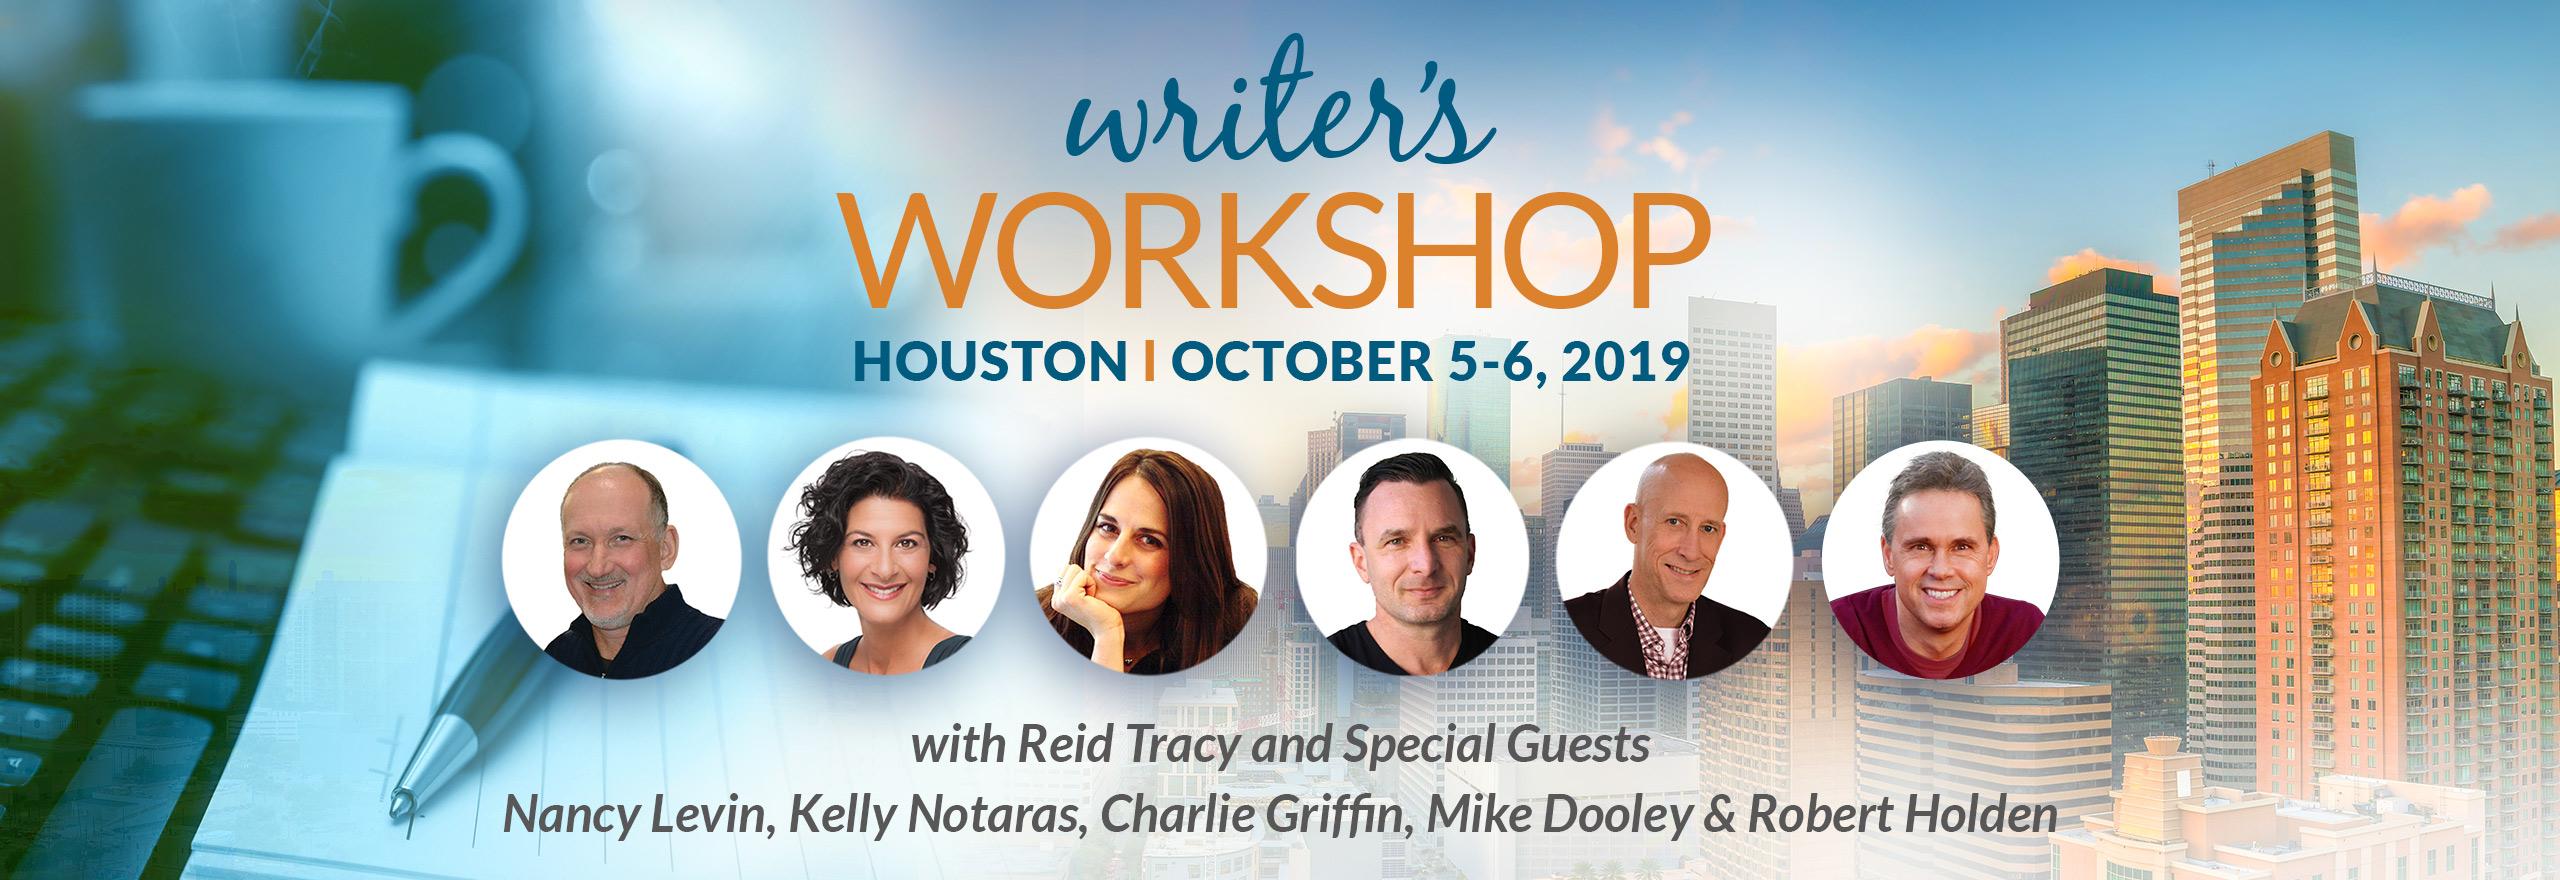 Writer's Workshop - Houston